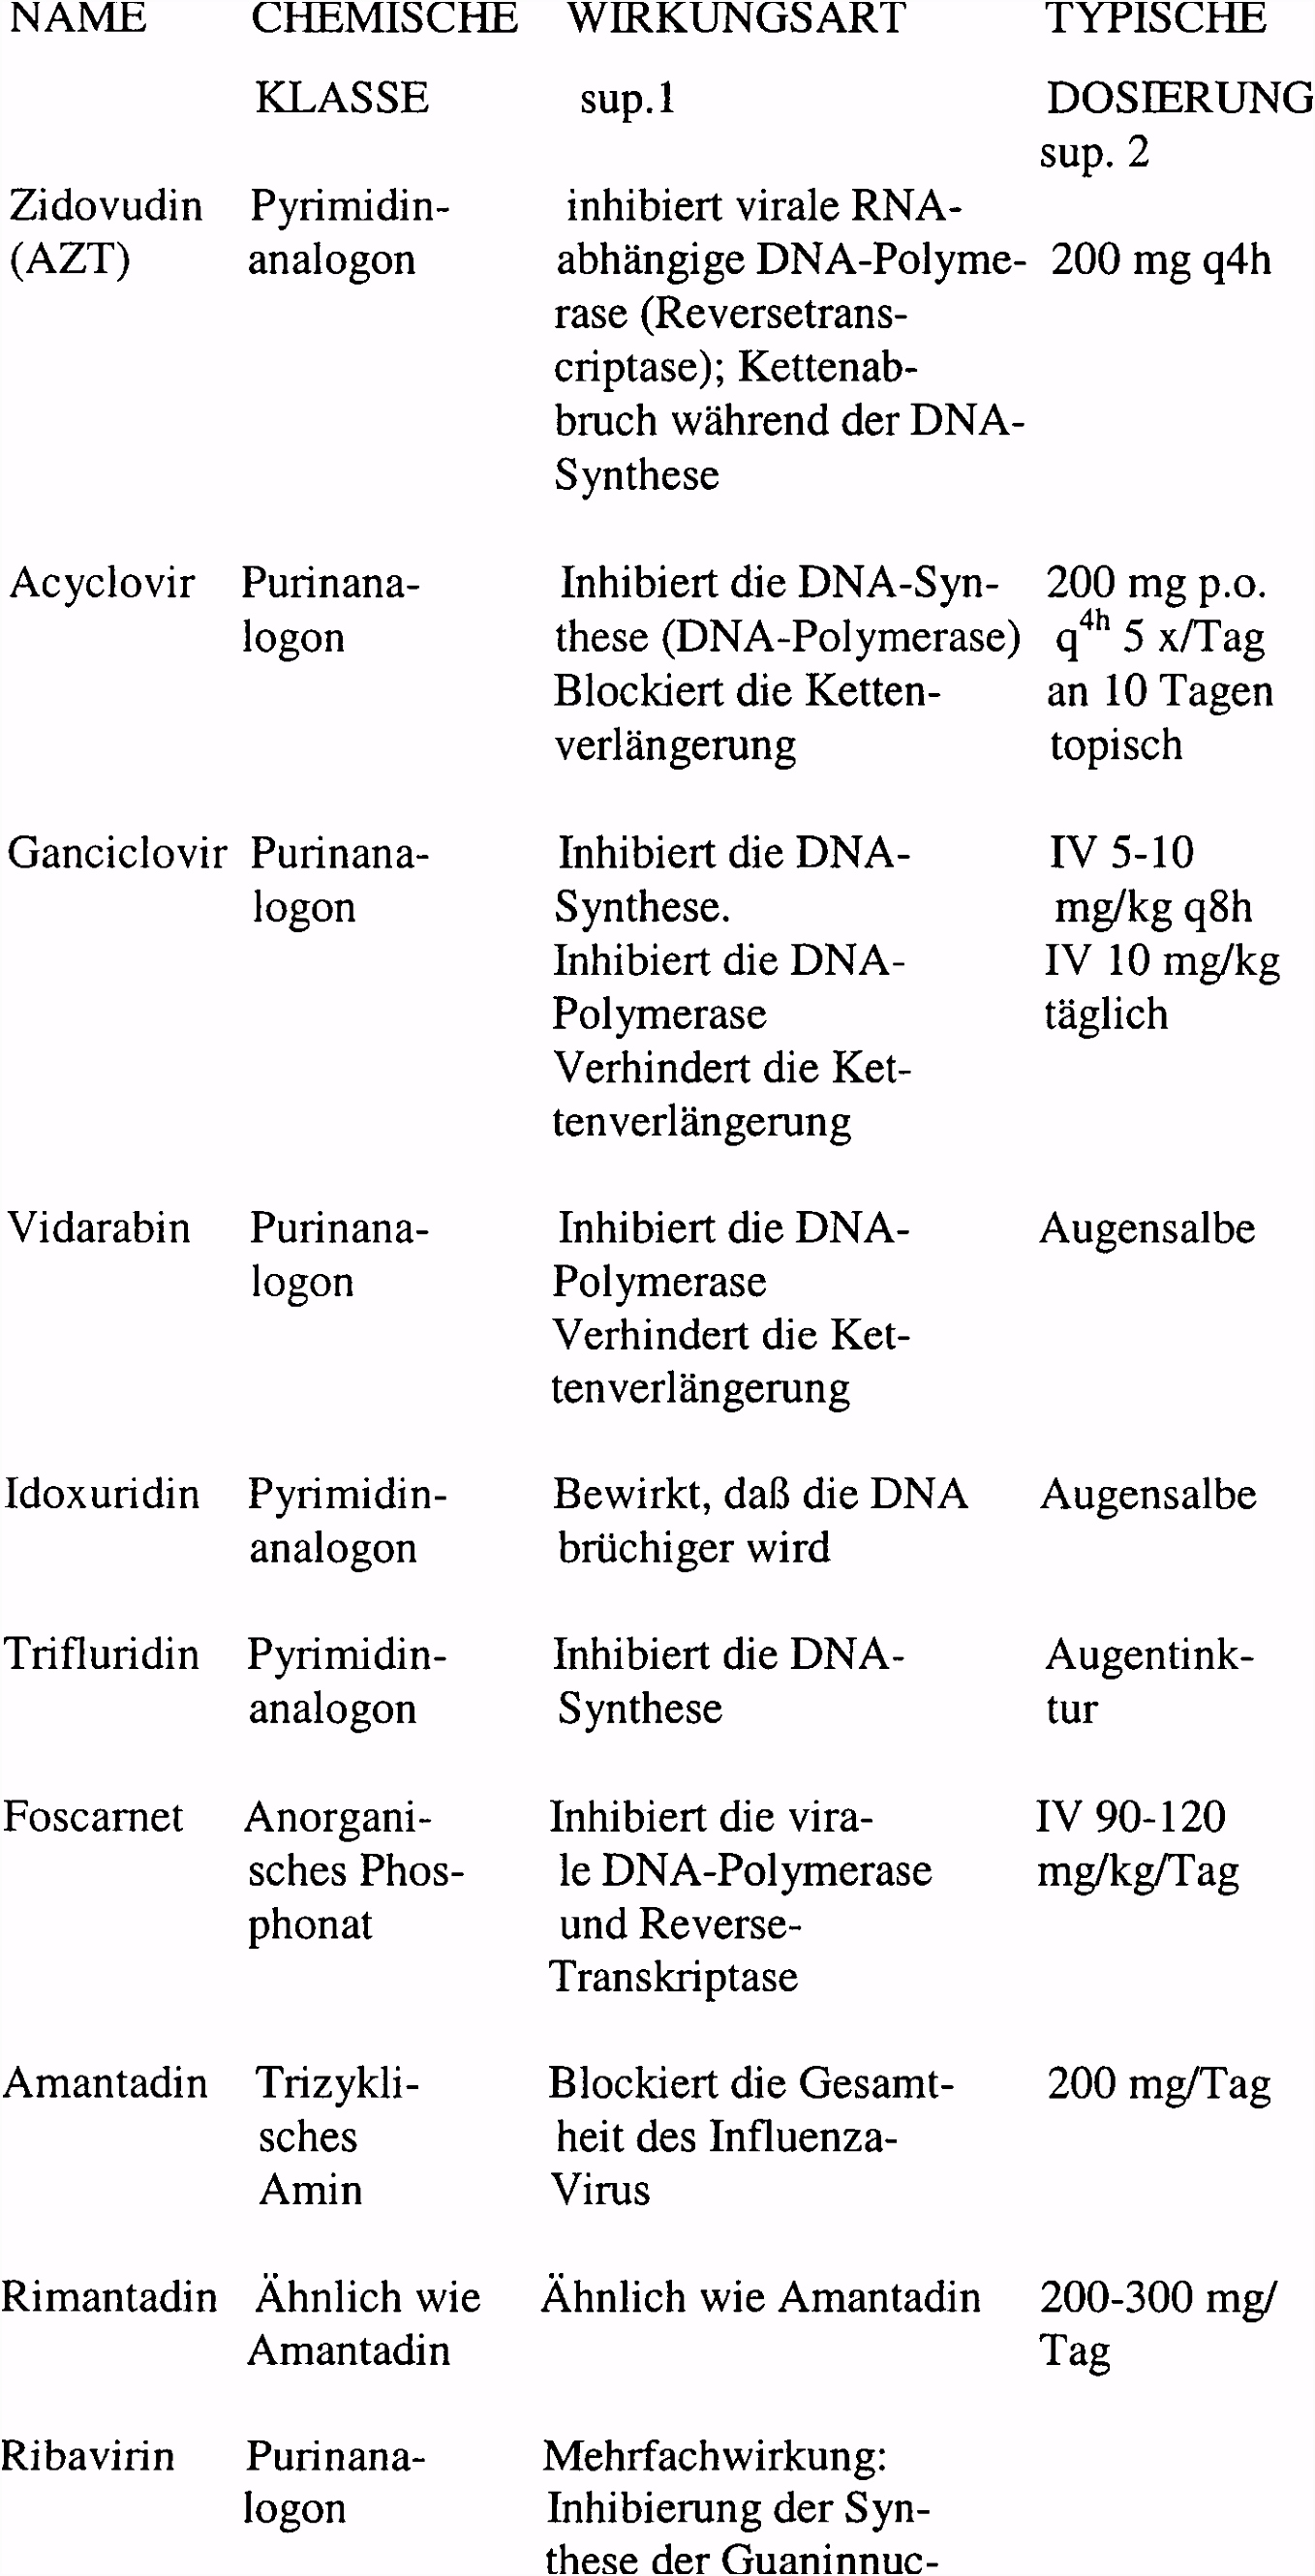 DE T2 Treatment of hepatitis c with thymosin interferon